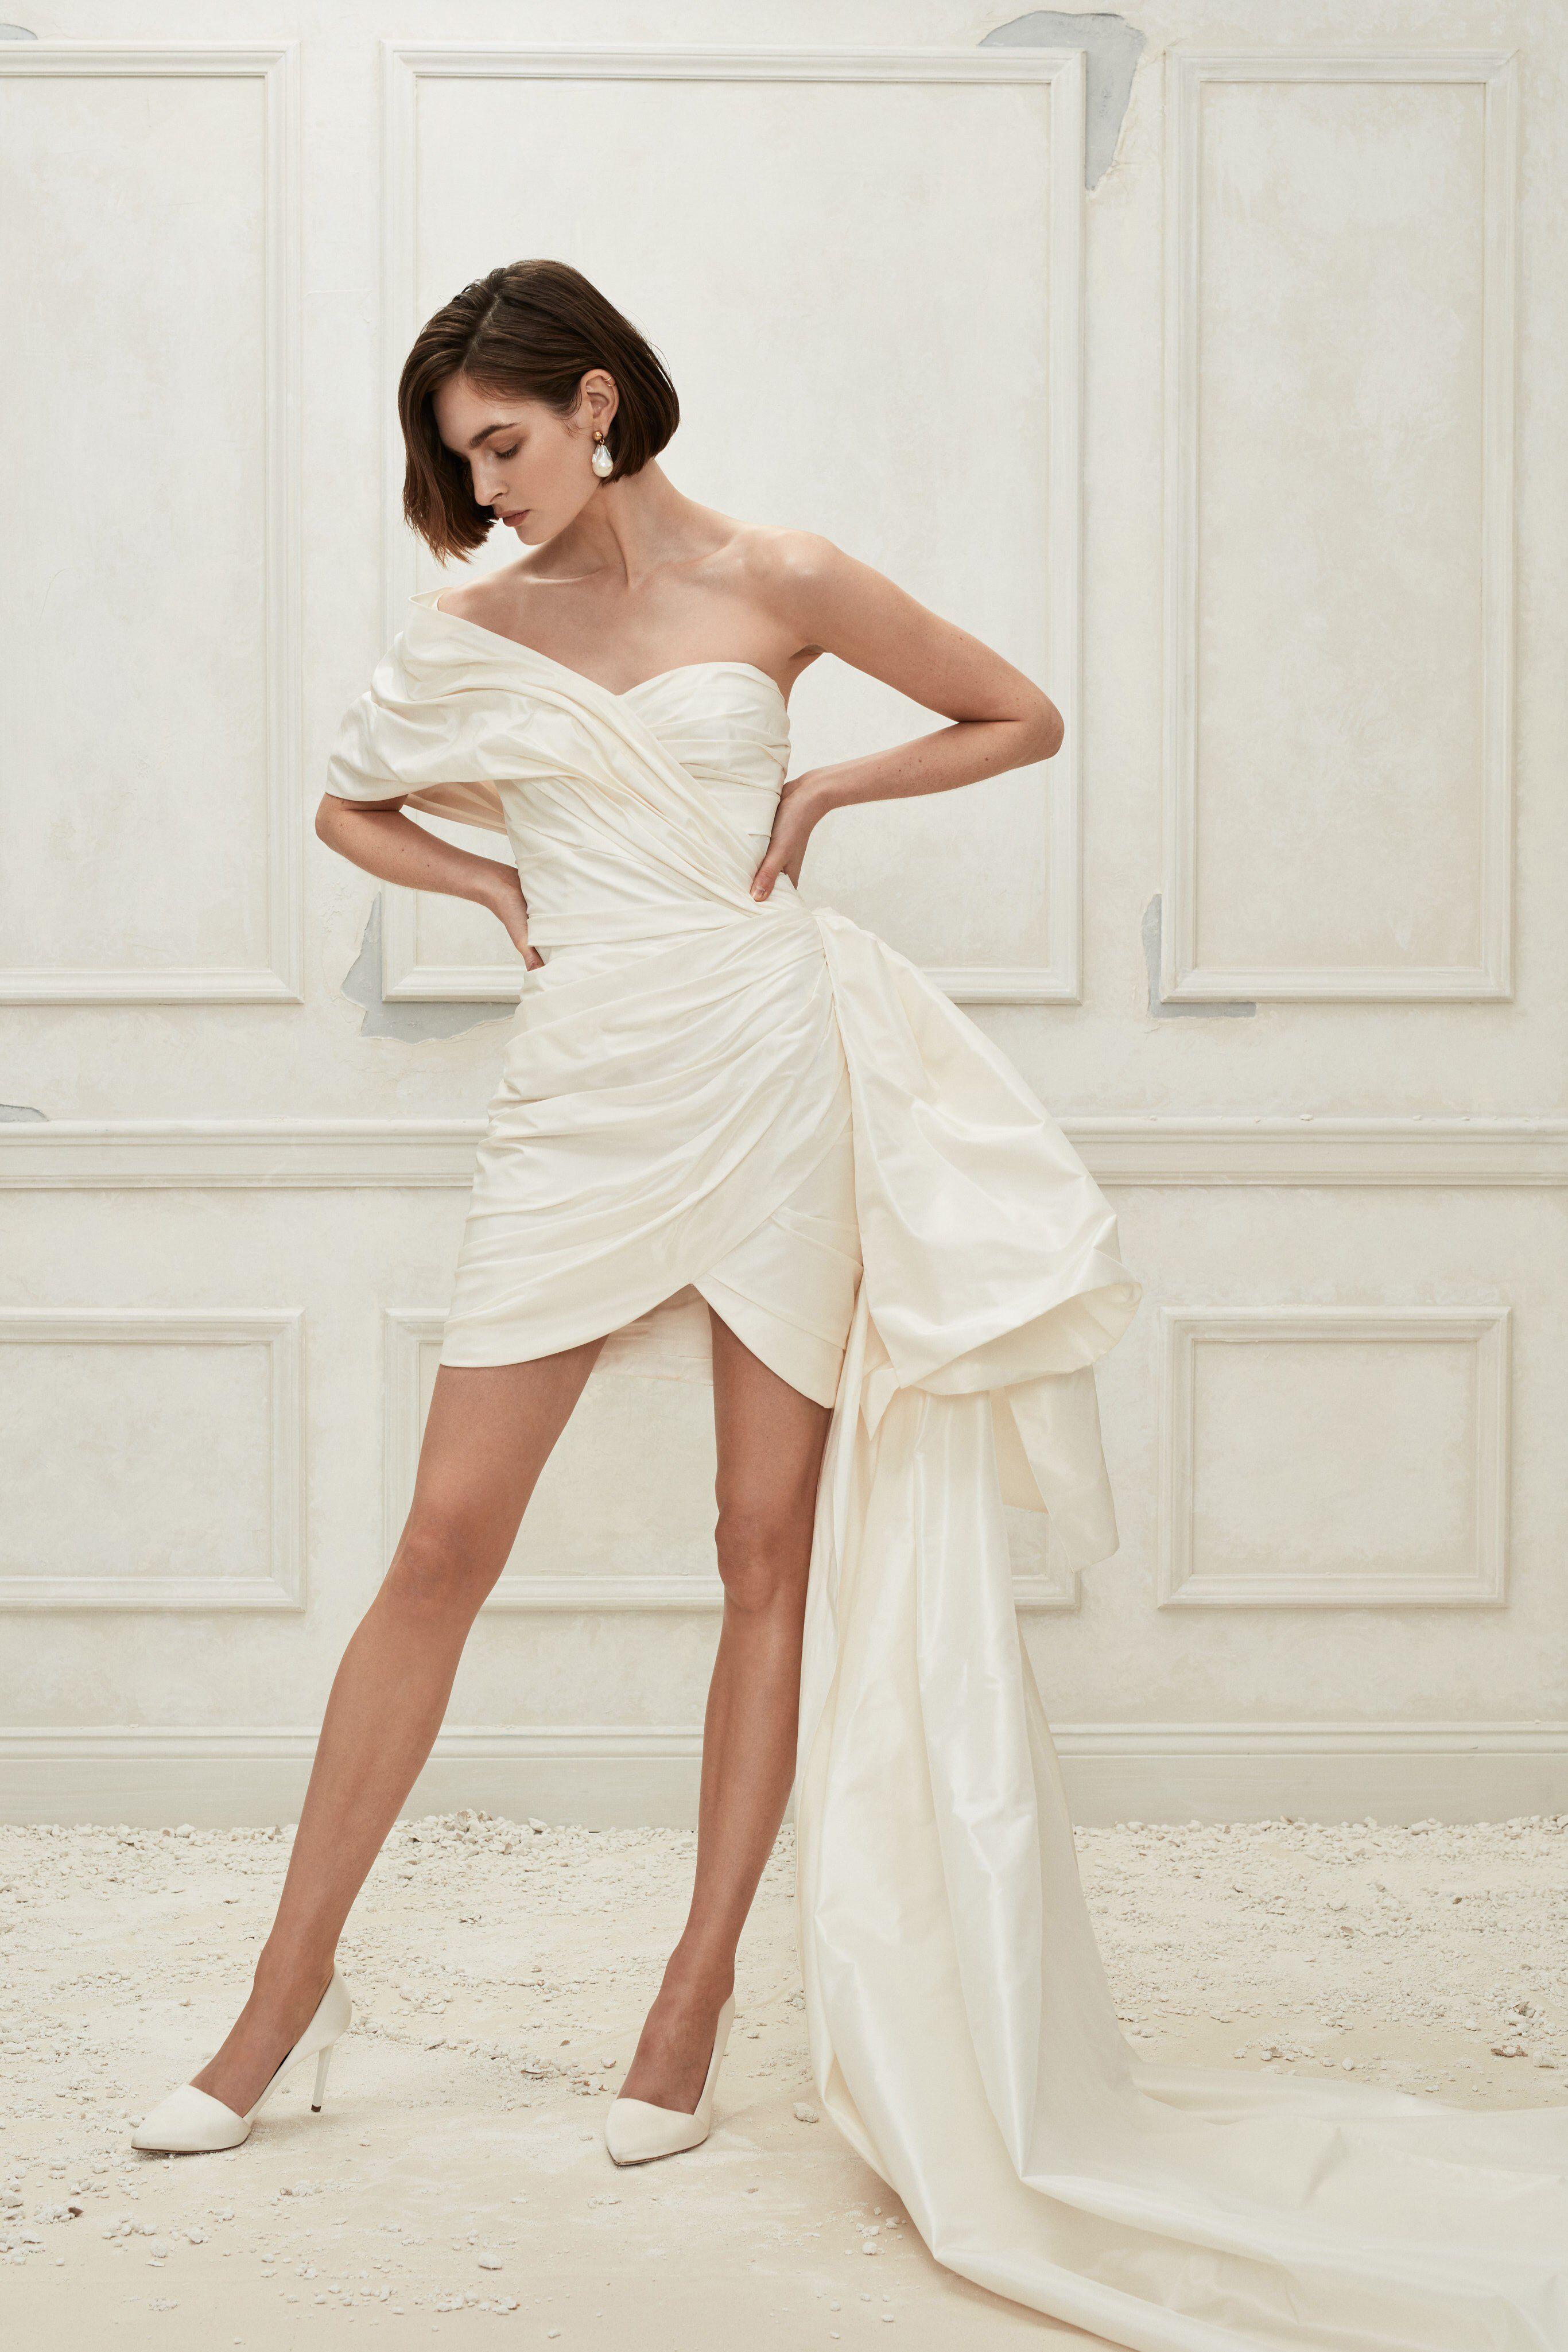 f4b6ab1487f Oscar de la Renta Fall 2019 Bridal Fashion Show Collection  See the  complete Oscar de la Renta Fall 2019 Bridal collection. Look 7